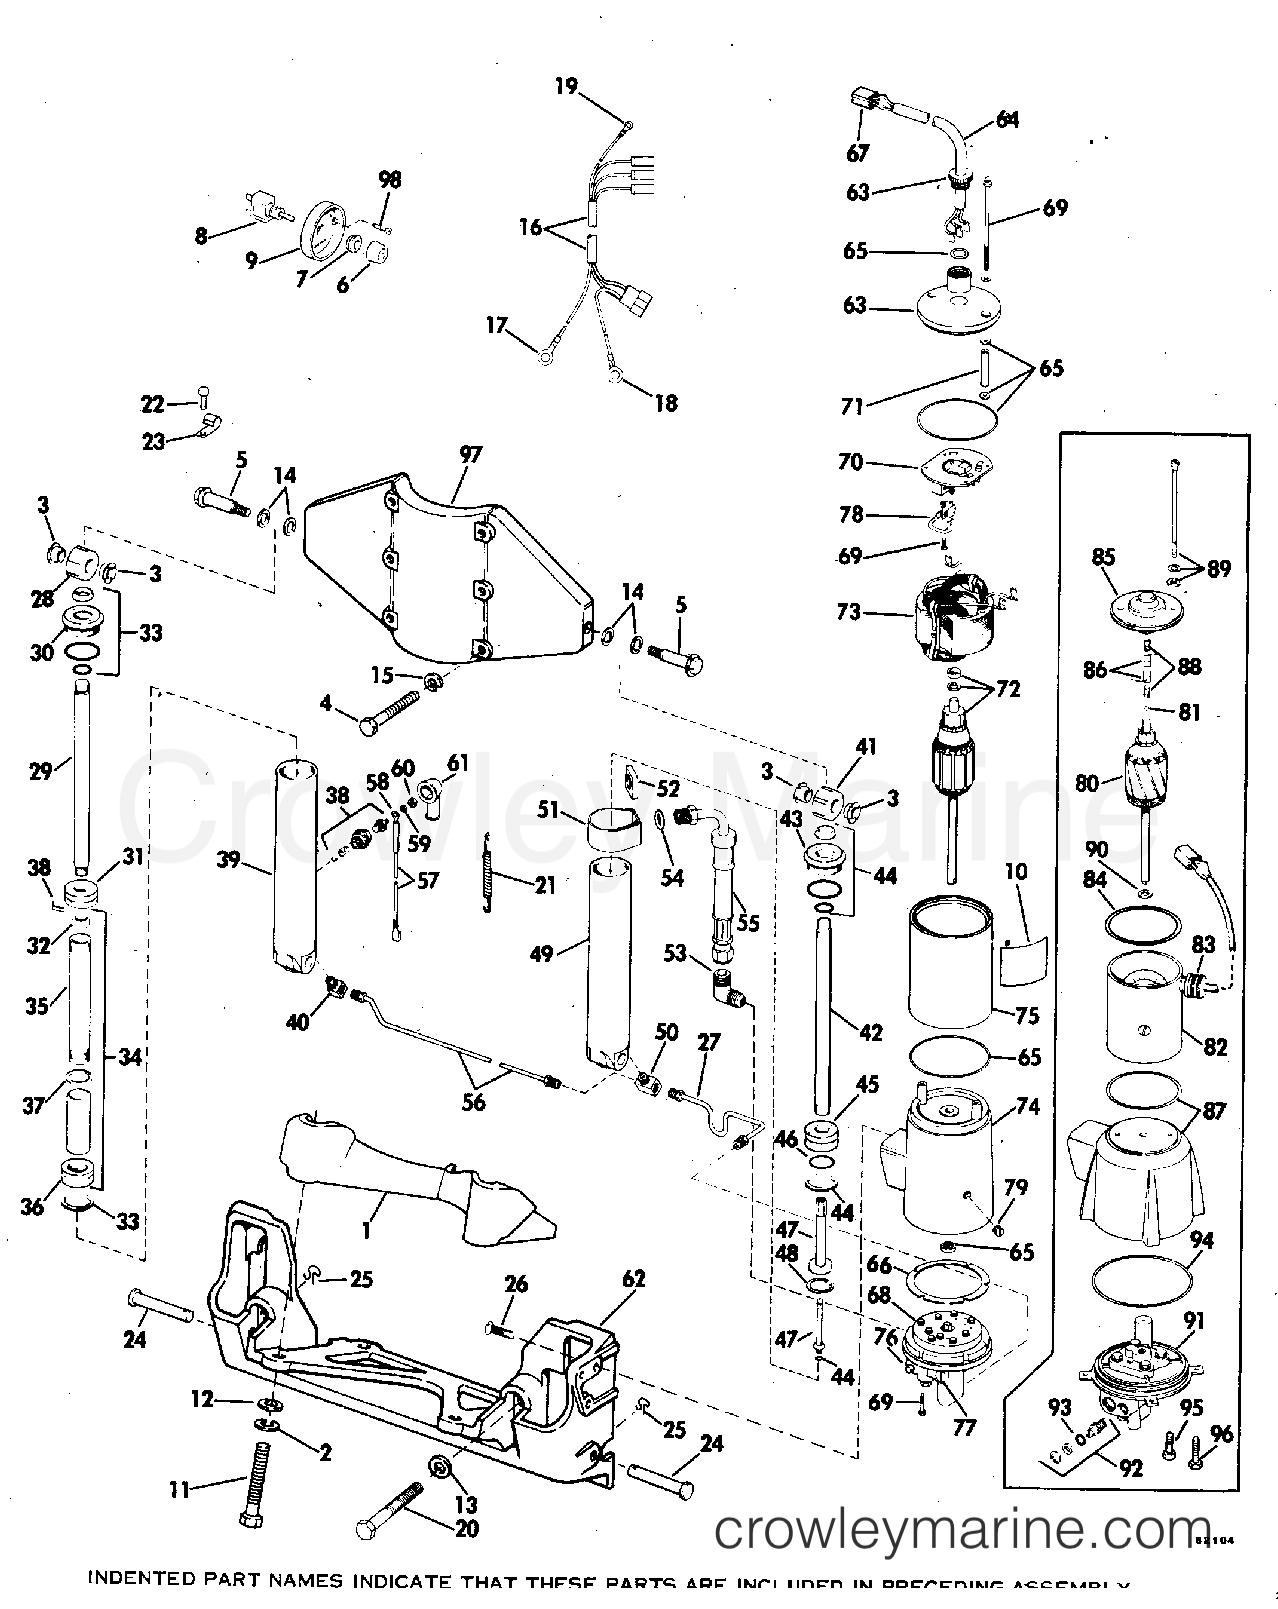 honda cn250 helix vacuum diagram  honda  auto wiring diagram